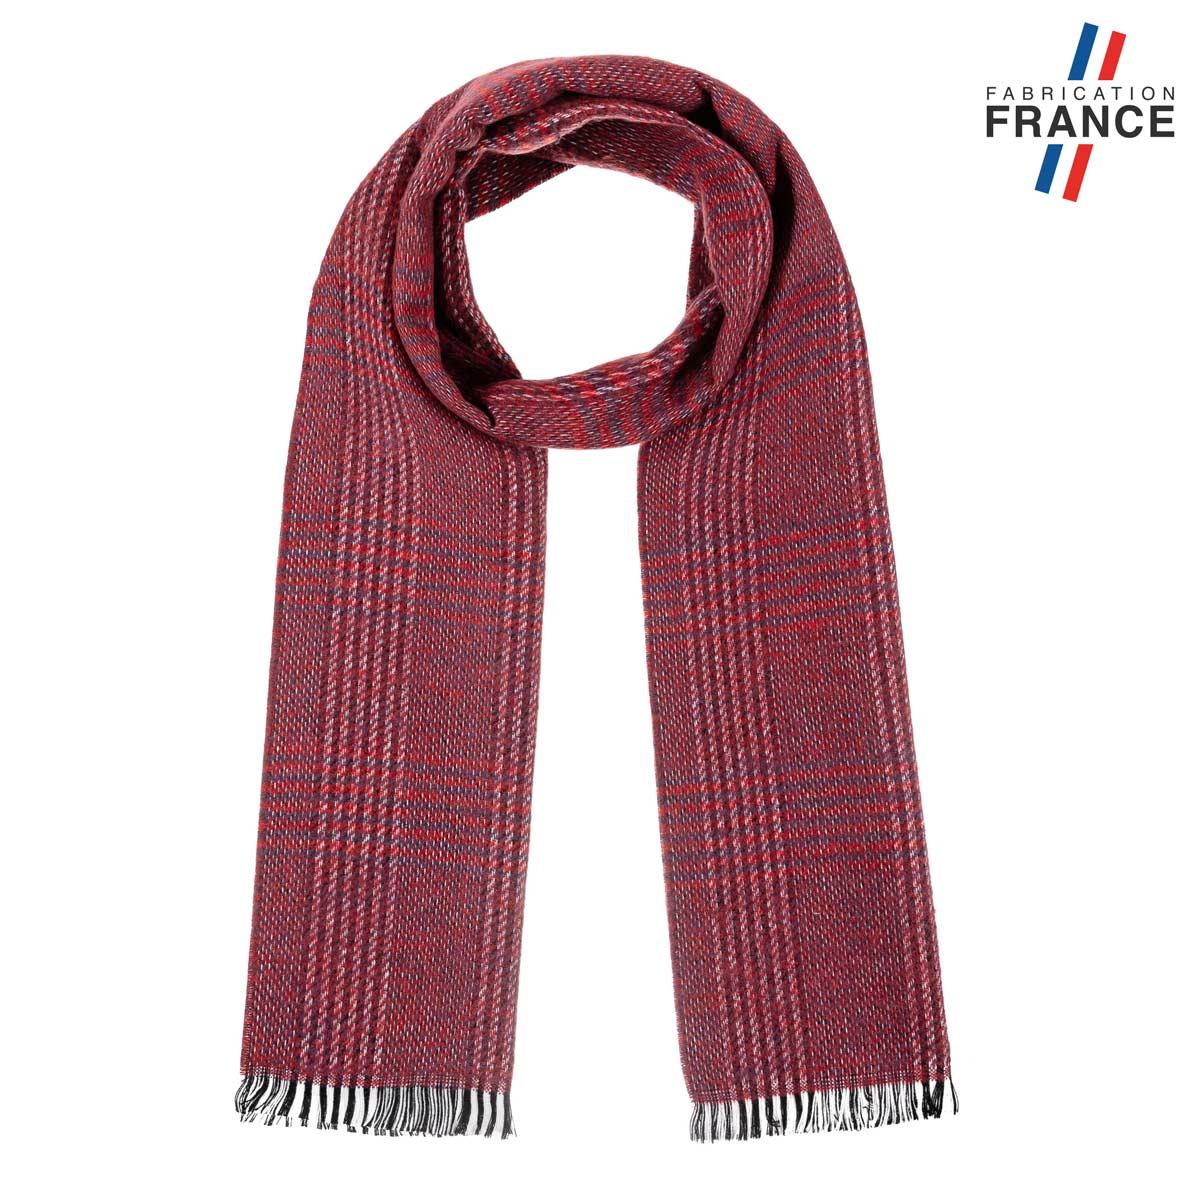 AT-06217_F12-1FR_Echarpe-alpaga-pourpre-made-in-france